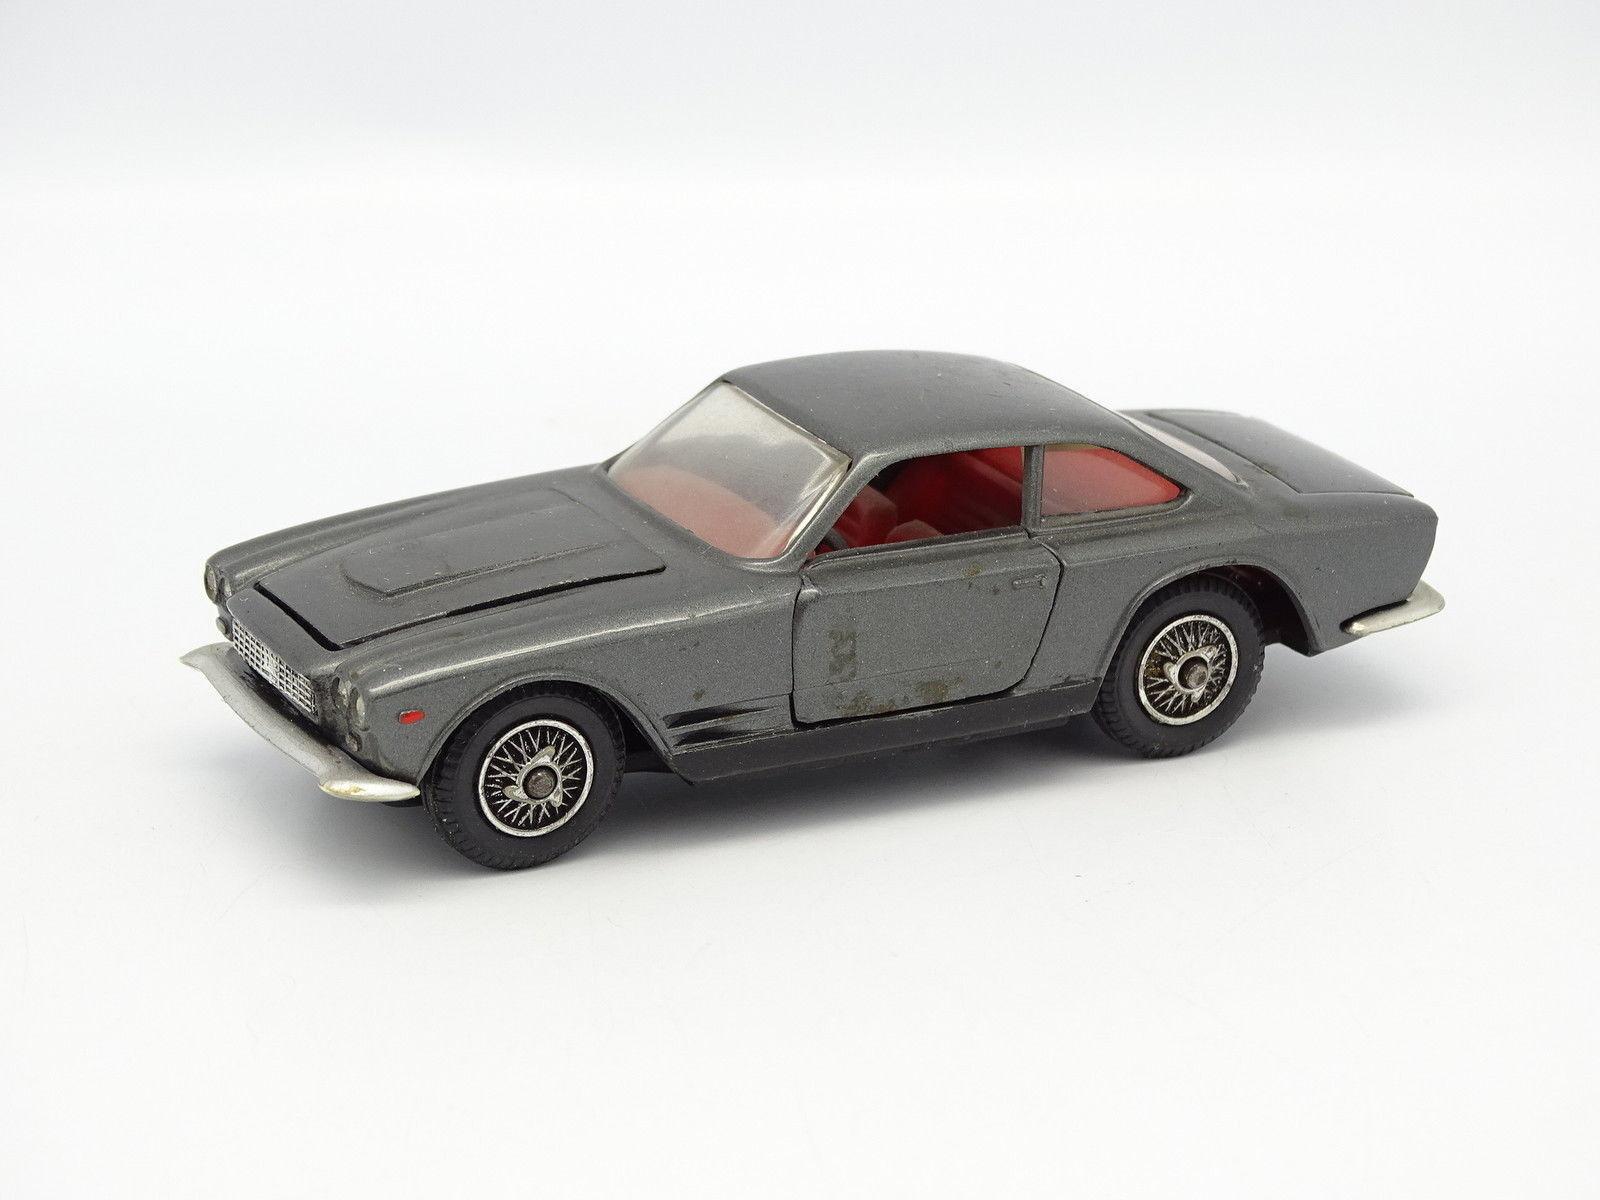 Politoys Sb 1 43 - Maserati 3500 Gt Grau